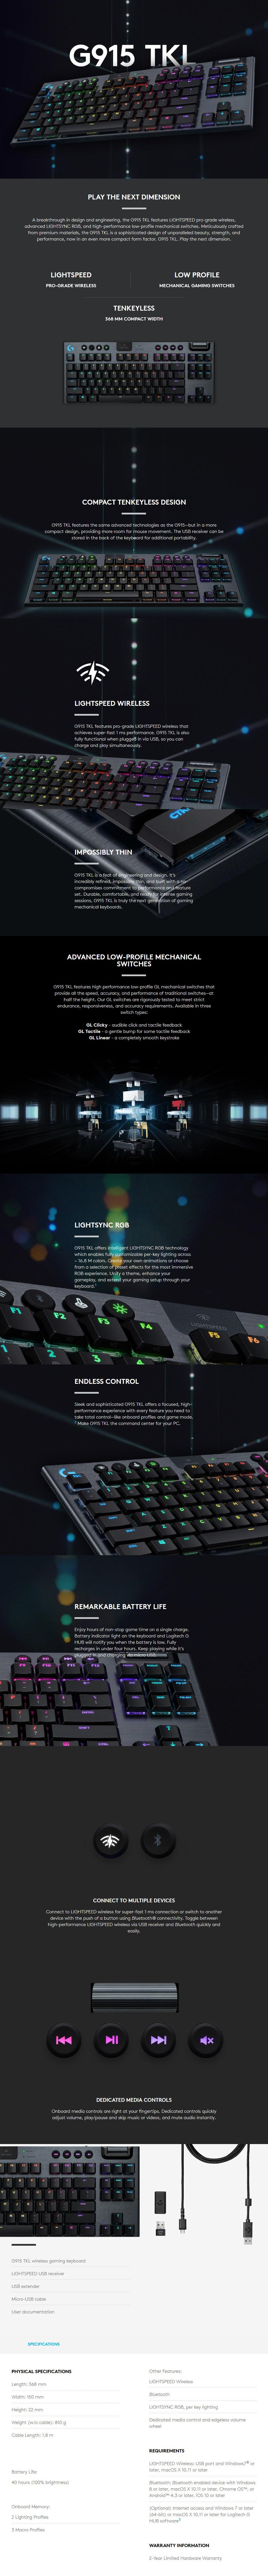 Logitech G915 TKL LIGHTSPEED Wireless Mechanical Gaming Keyboard - GL Tactile - Overview 1